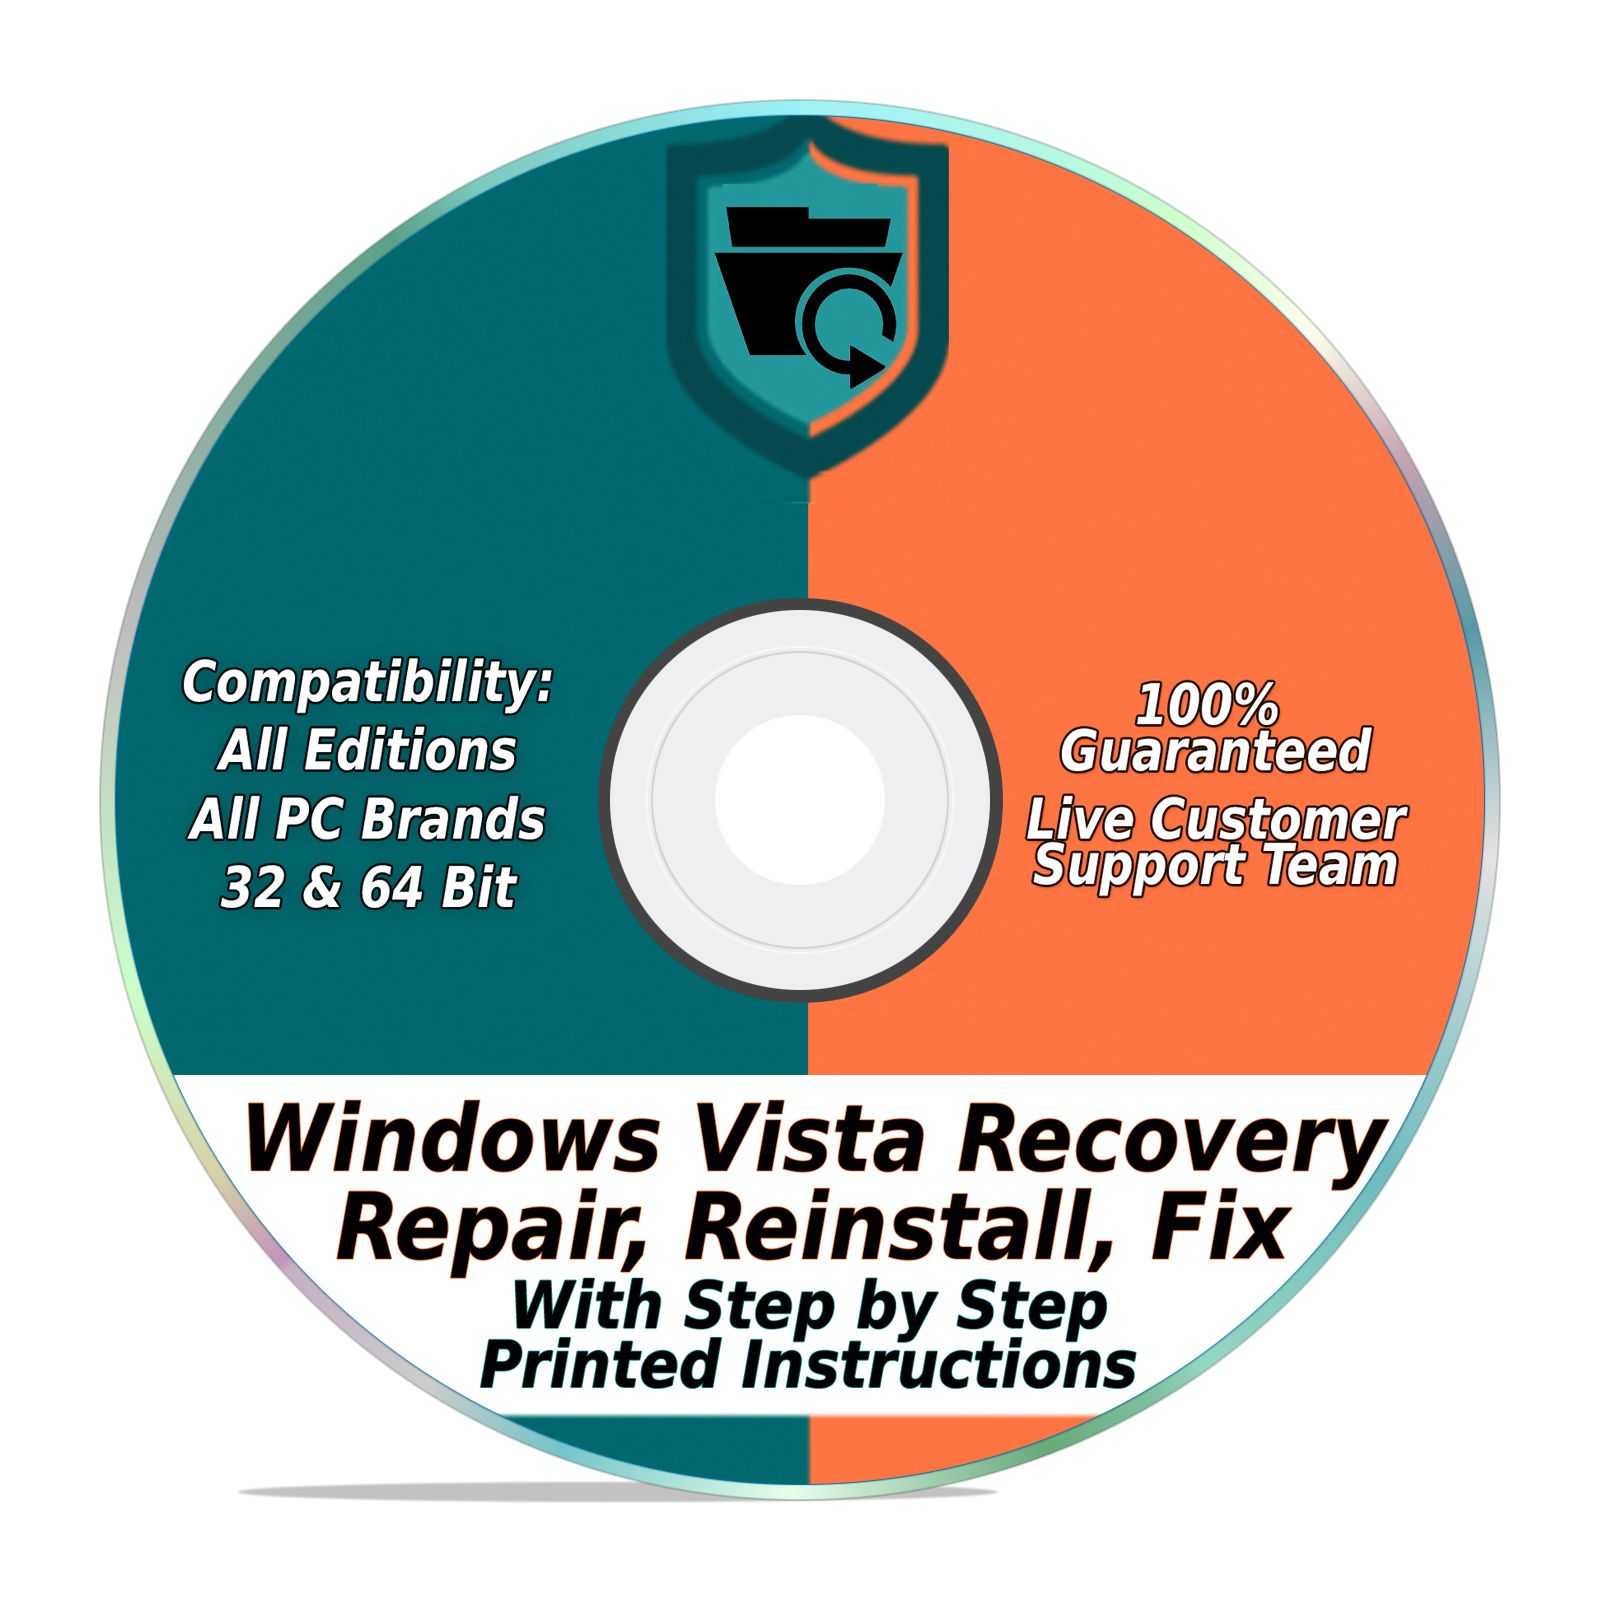 Pin by EzaLink on Windows Recovery Discs Computer checks